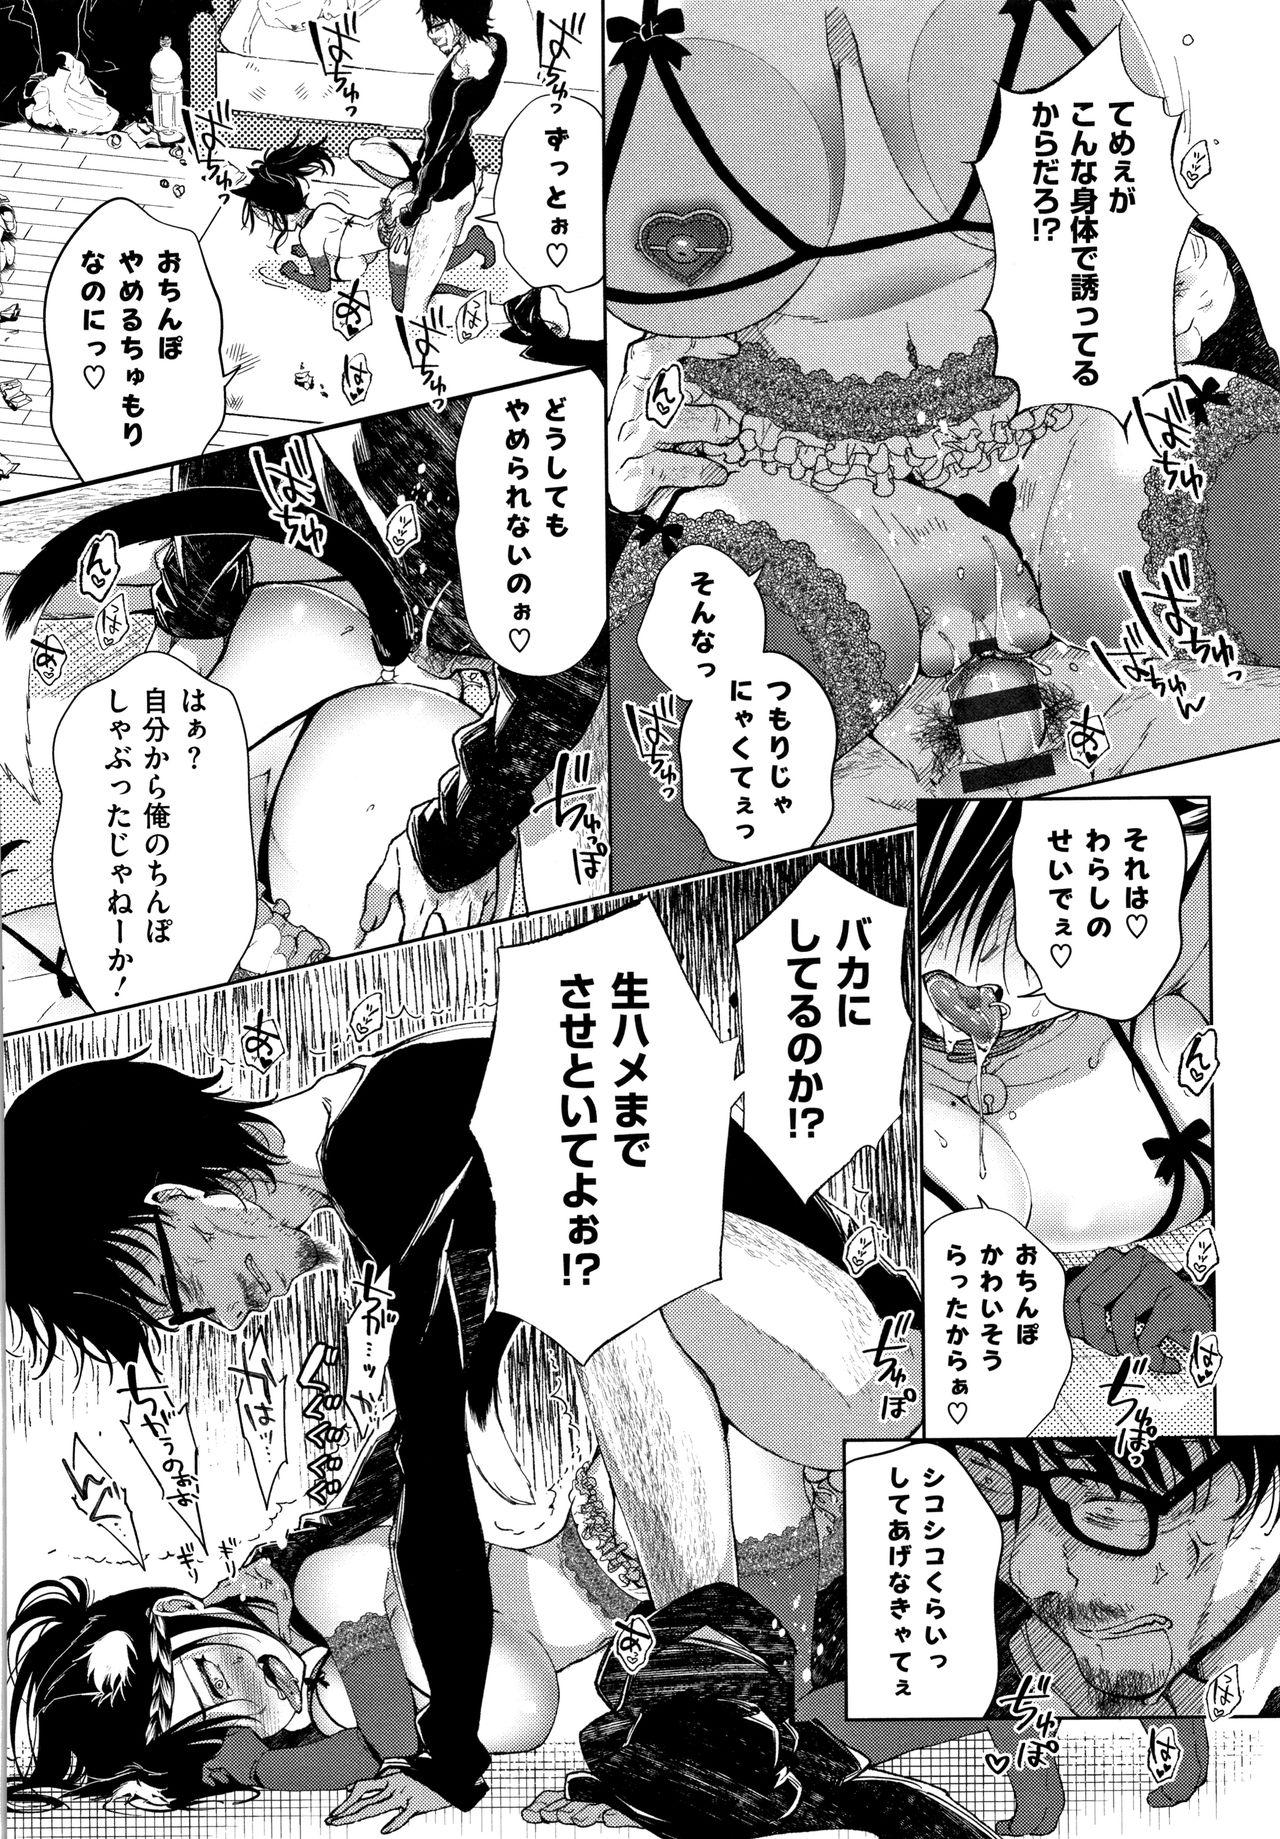 Saijaku Gal wa Ikizurai! - The weakest pussy is hard to go. 24